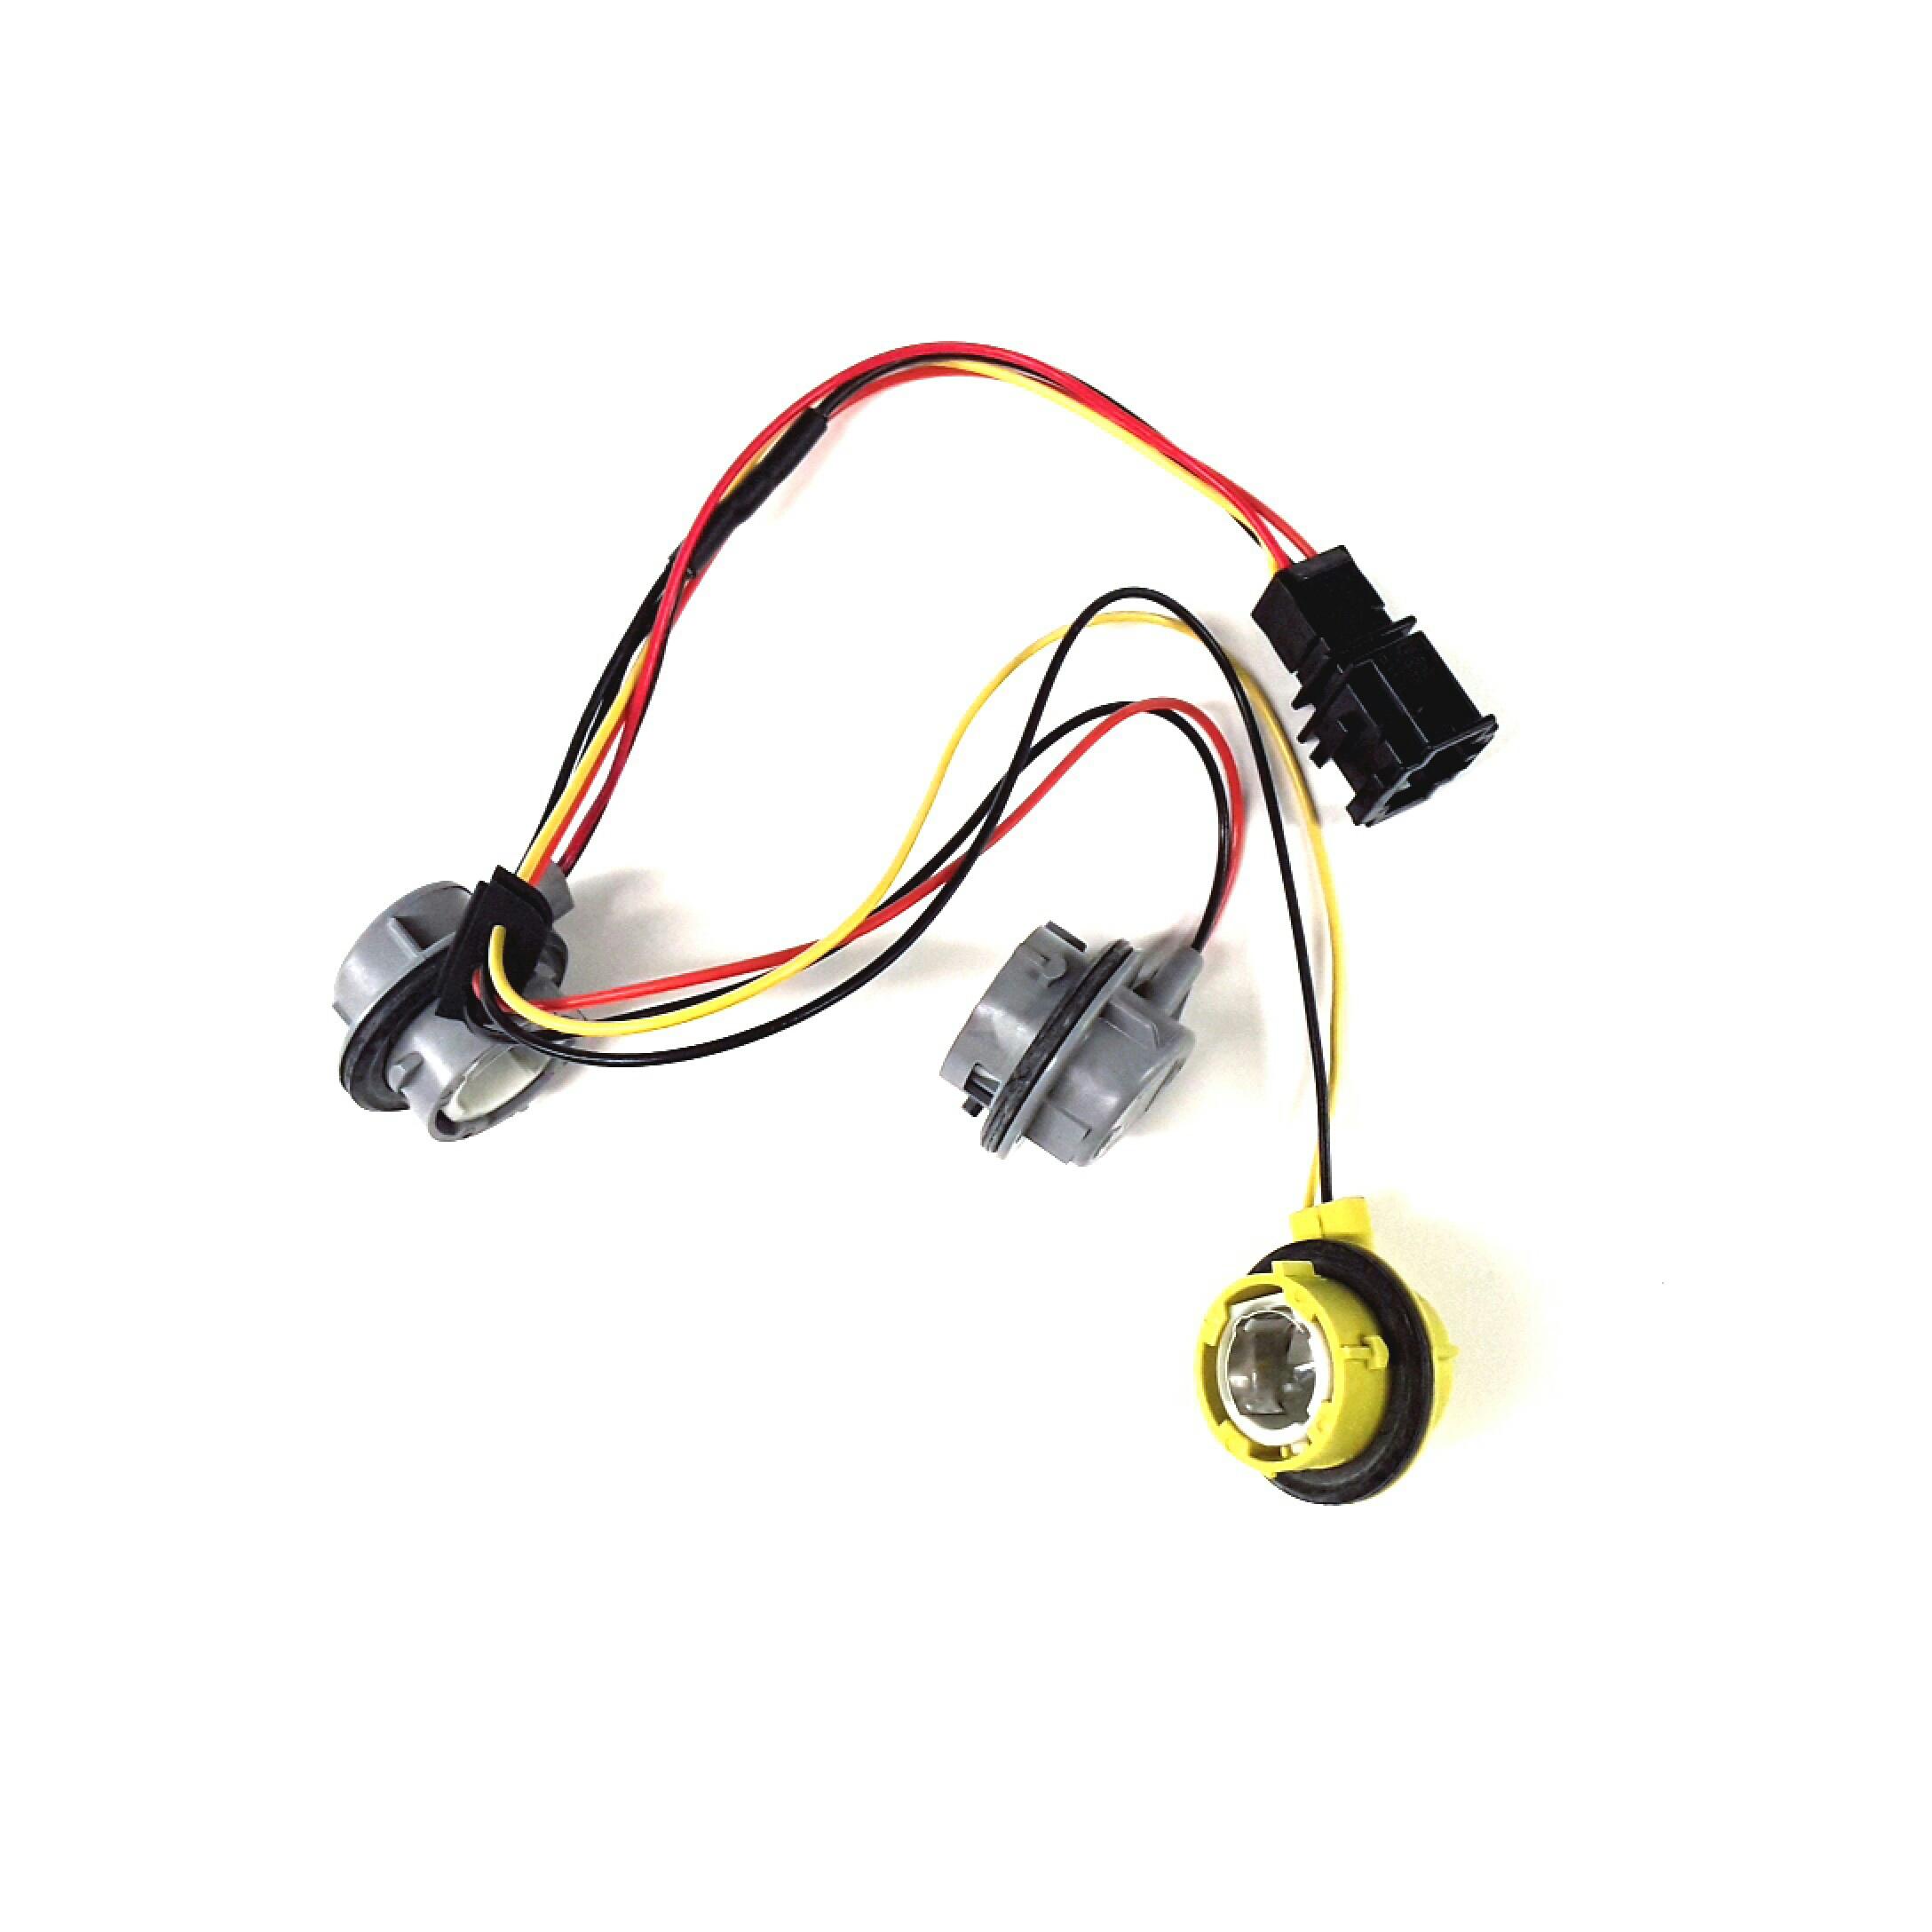 4l0945221b - Tail Light Harness  Gate  Lift  Lamps